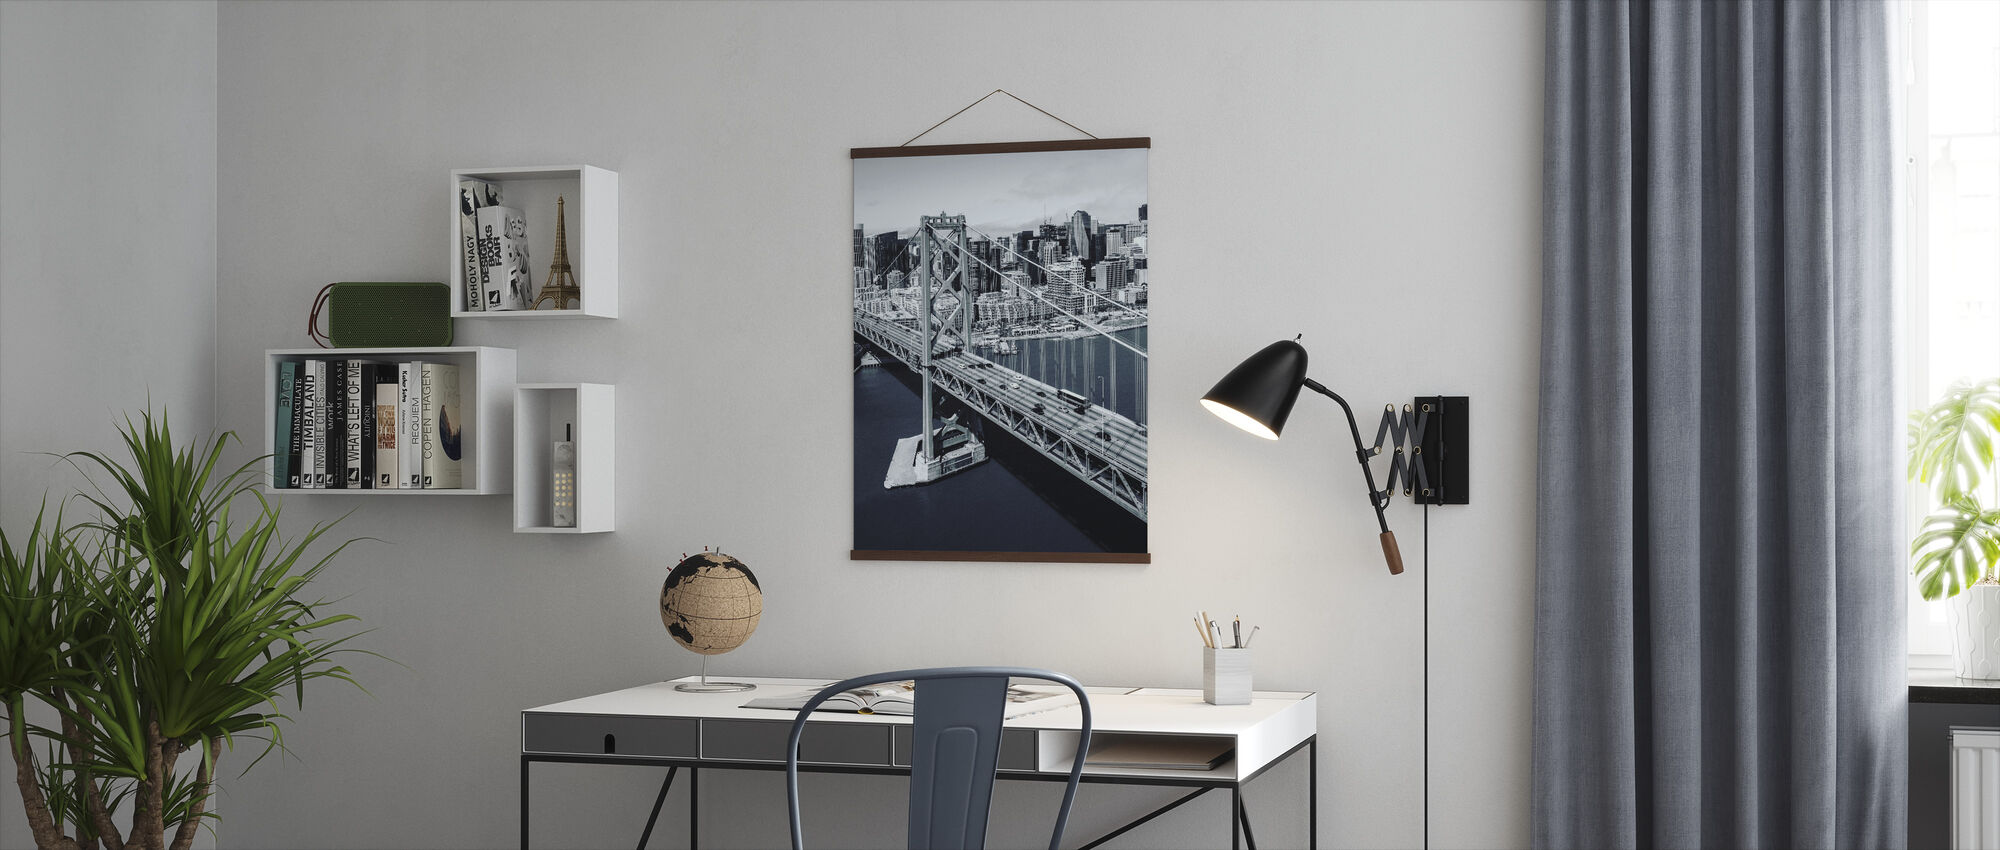 Bay Bridge - Juliste - Toimisto